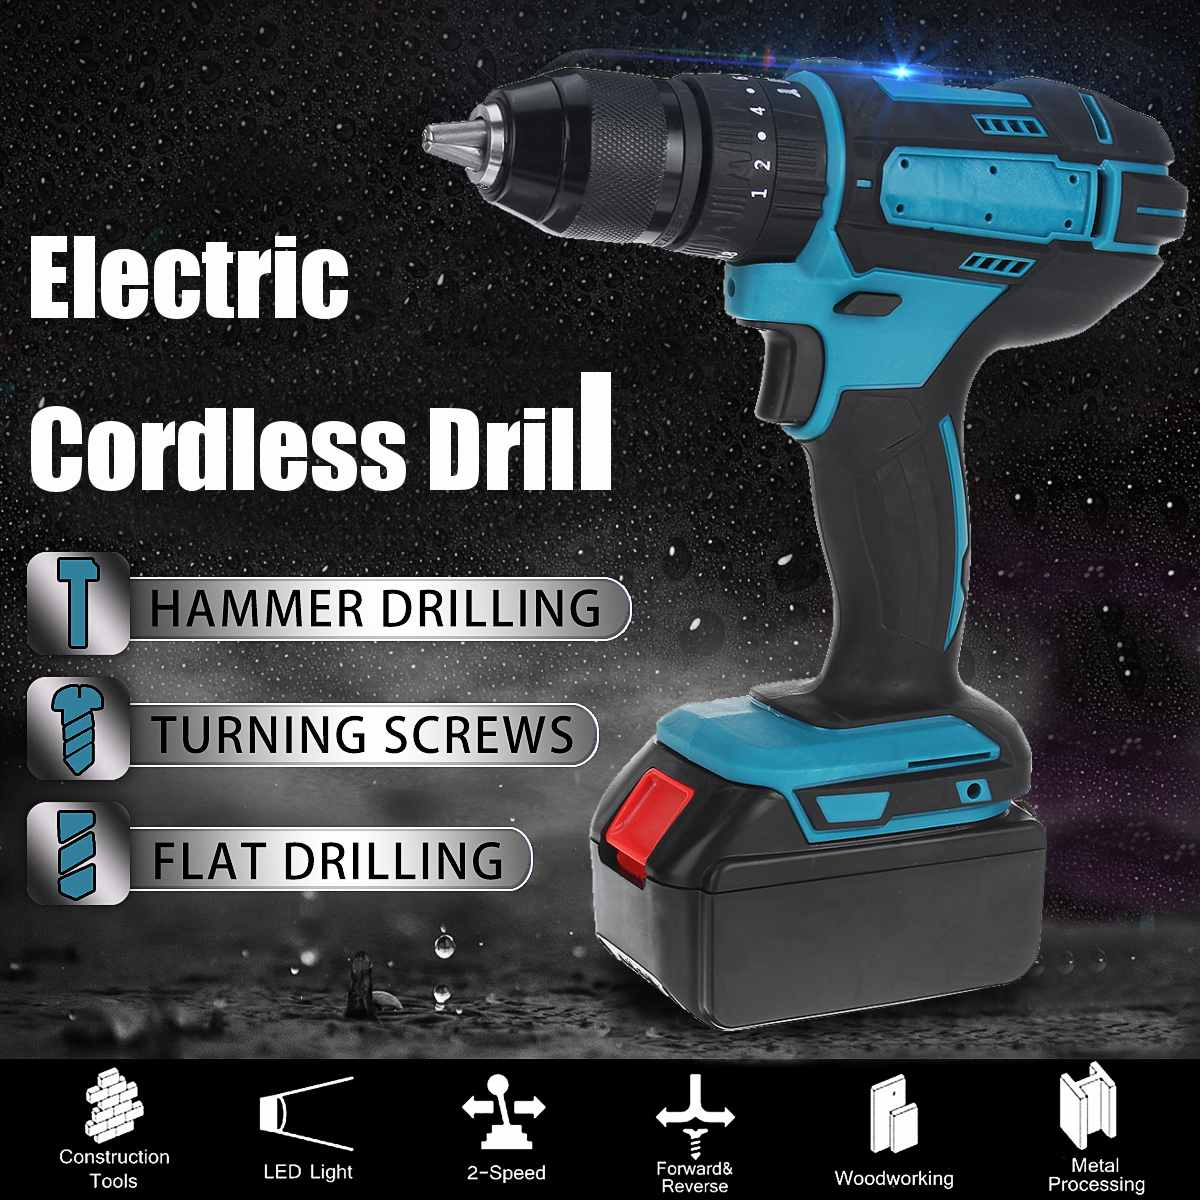 Cordless Electric Drill 68V 6500mAh Screwdriver 25+3 Torque Impact Drills 2-Speed Tools Power Driver Li-ion Battery + LED lights